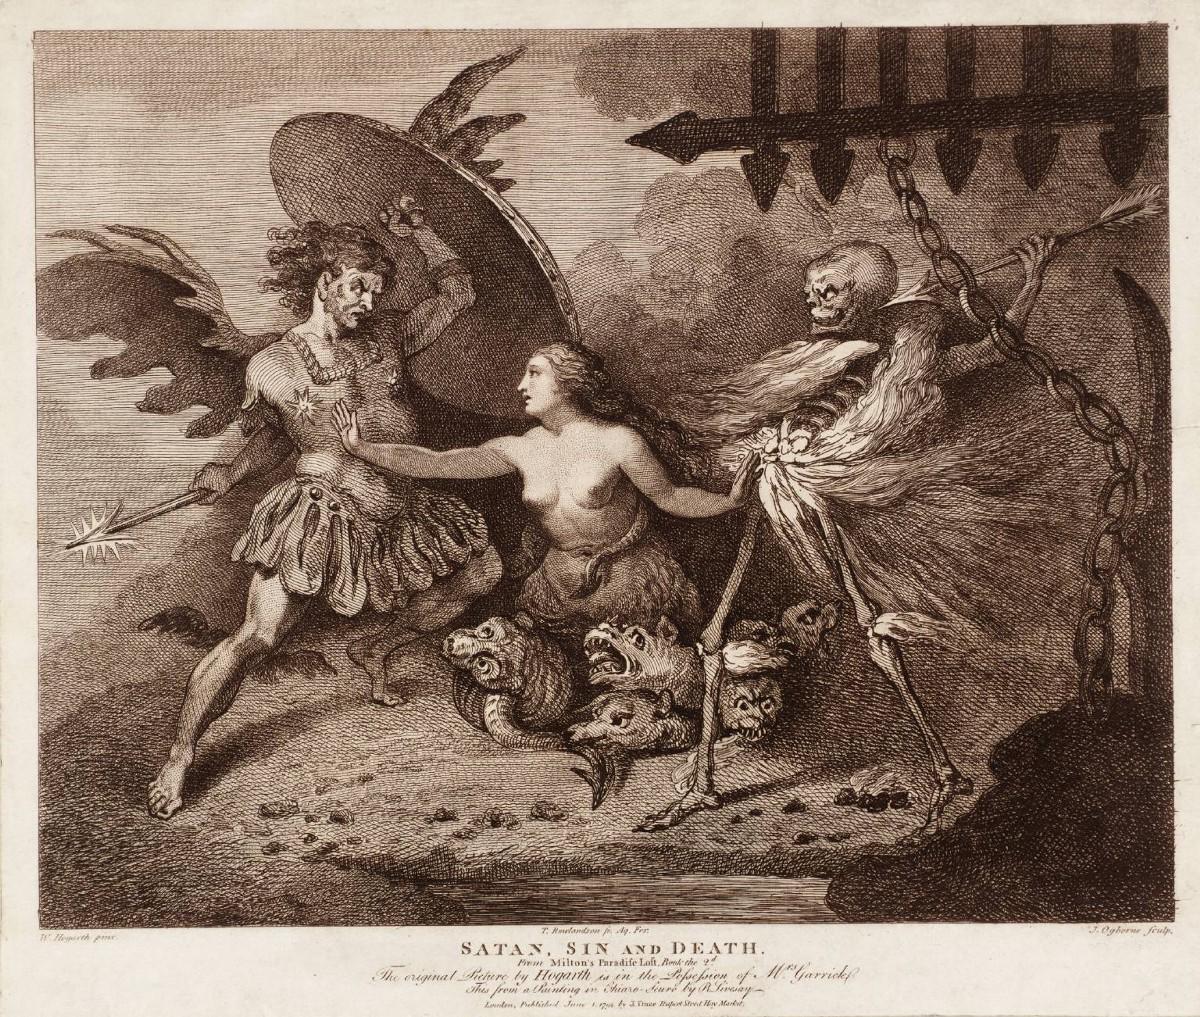 satan sin and death - milton